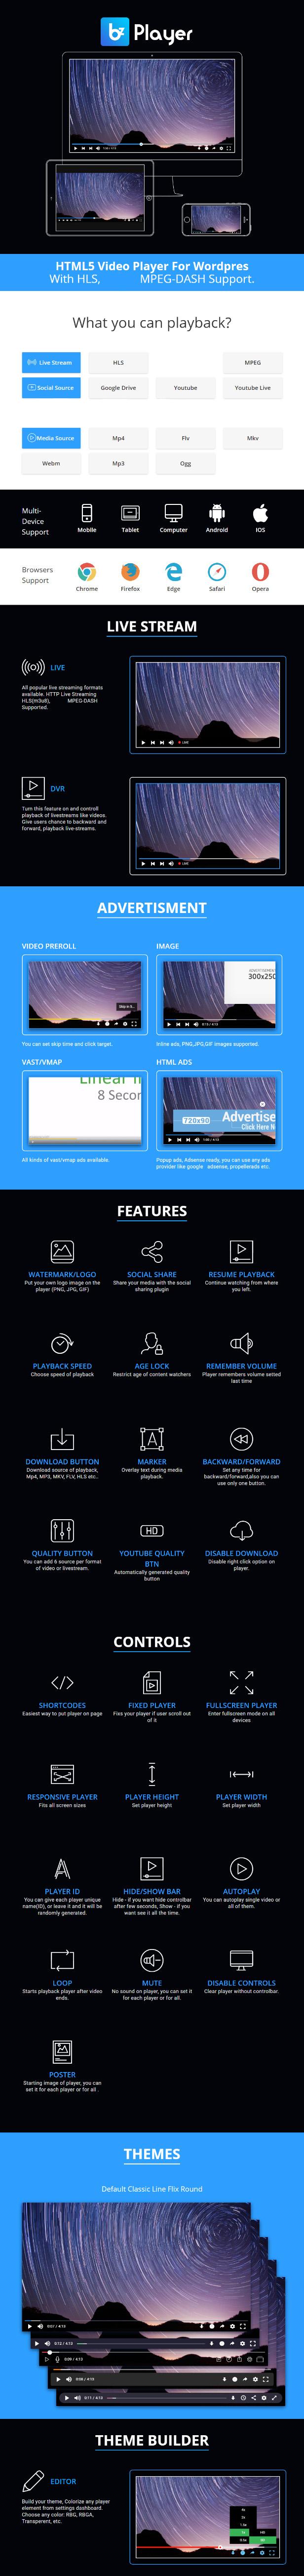 bzplayer Pro - Live Streaming Player WordPress Plugin - 4